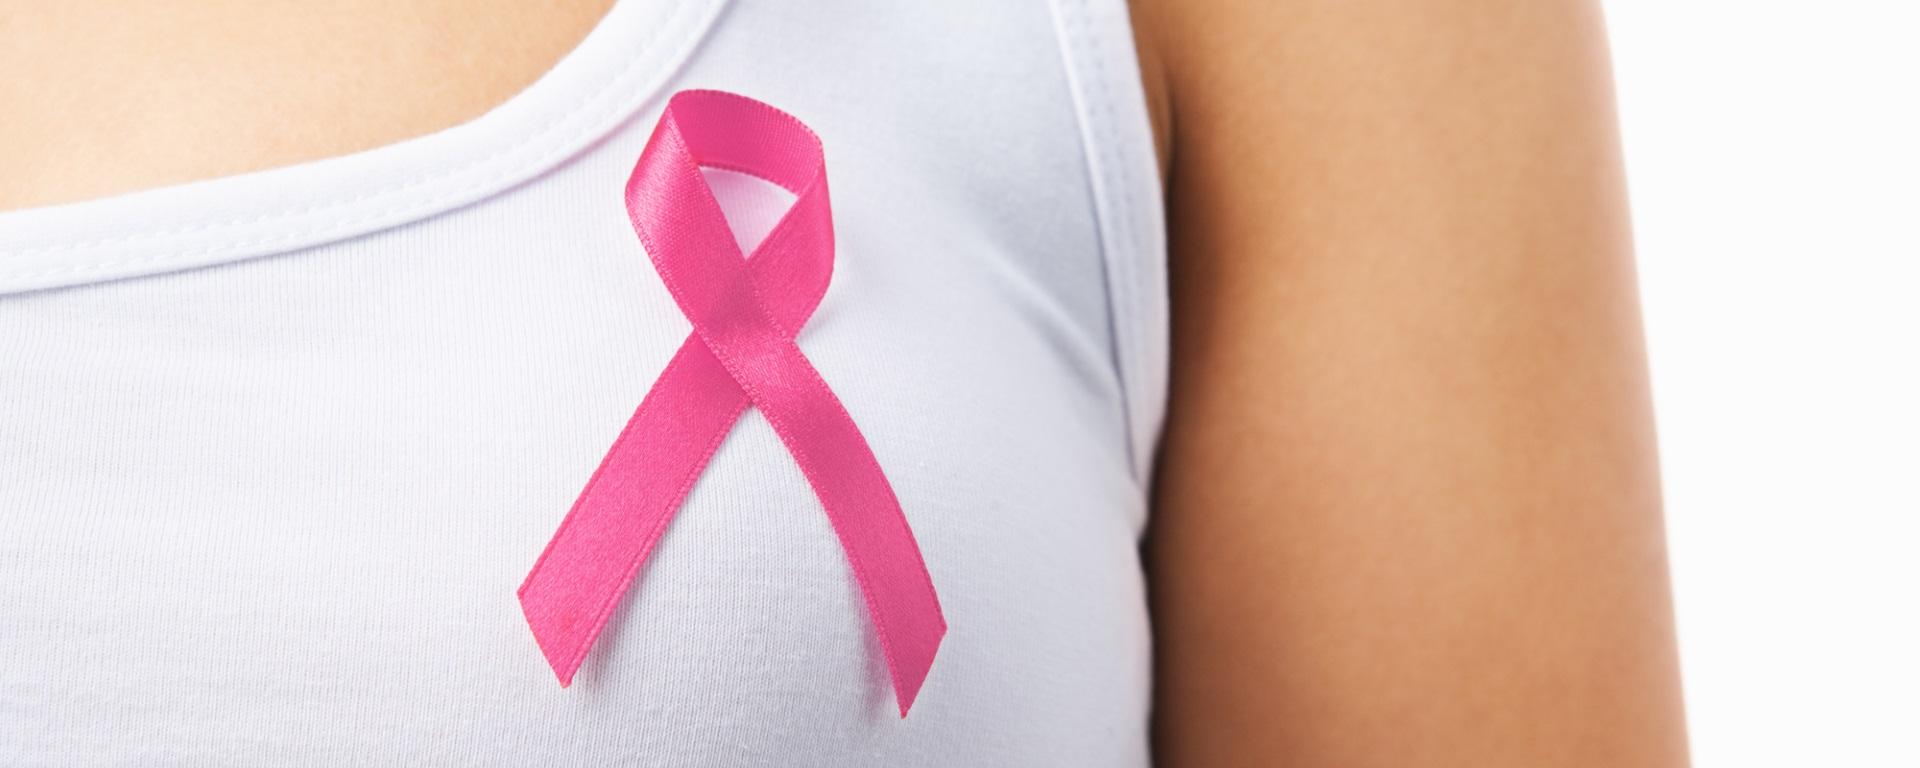 Mediterrane Ernährung kann das Brustkrebsrisiko senken